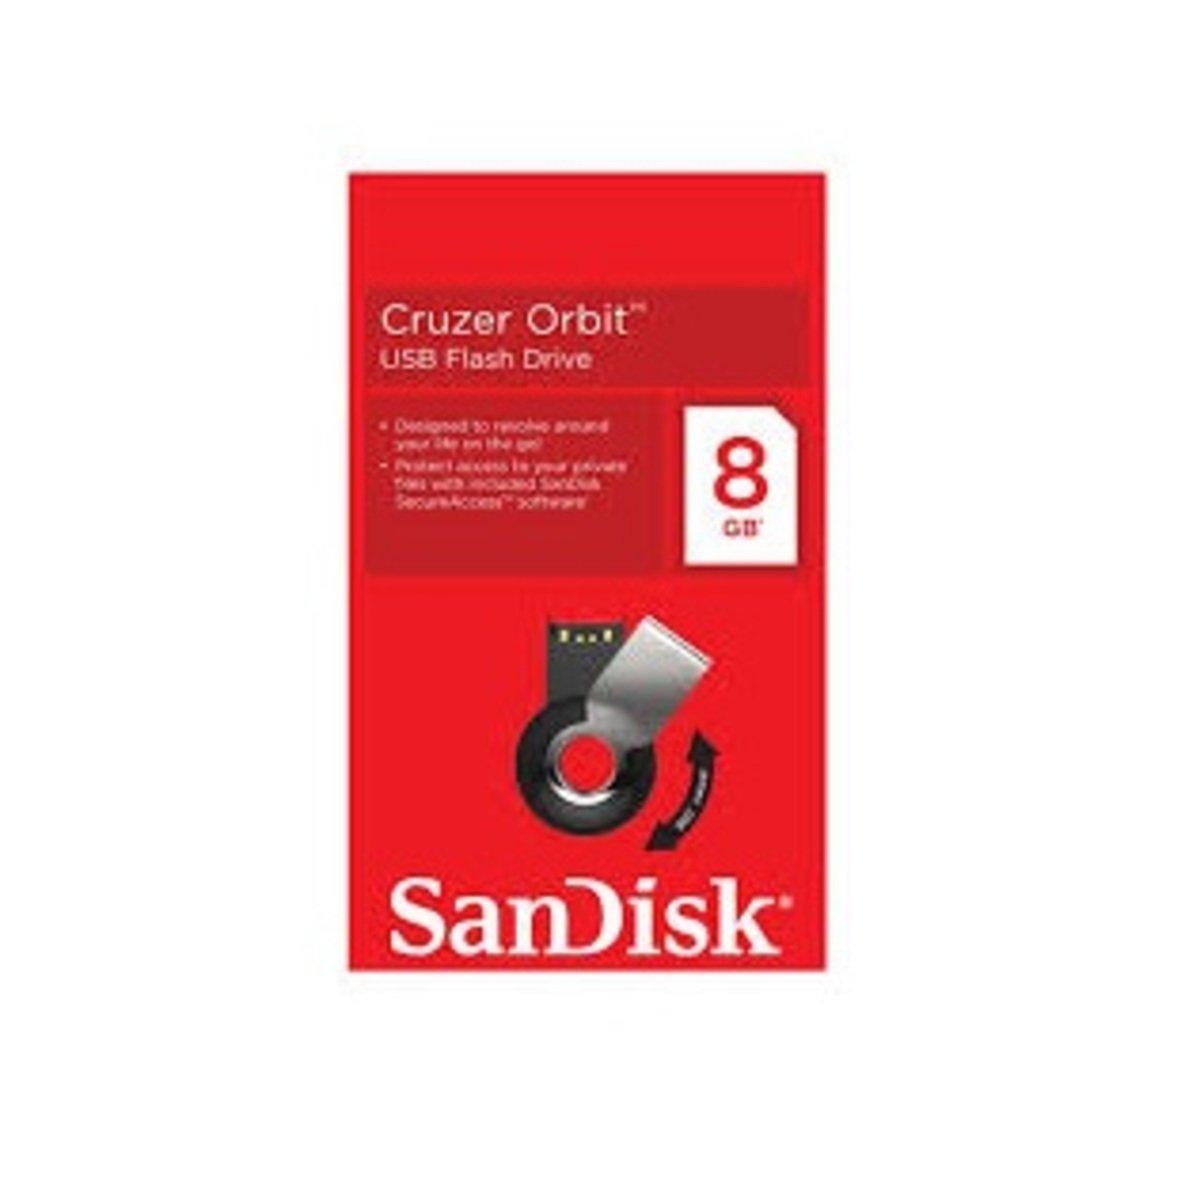 Cruzer Orbit SDCZ58 USB 旋轉蓋記憶手指